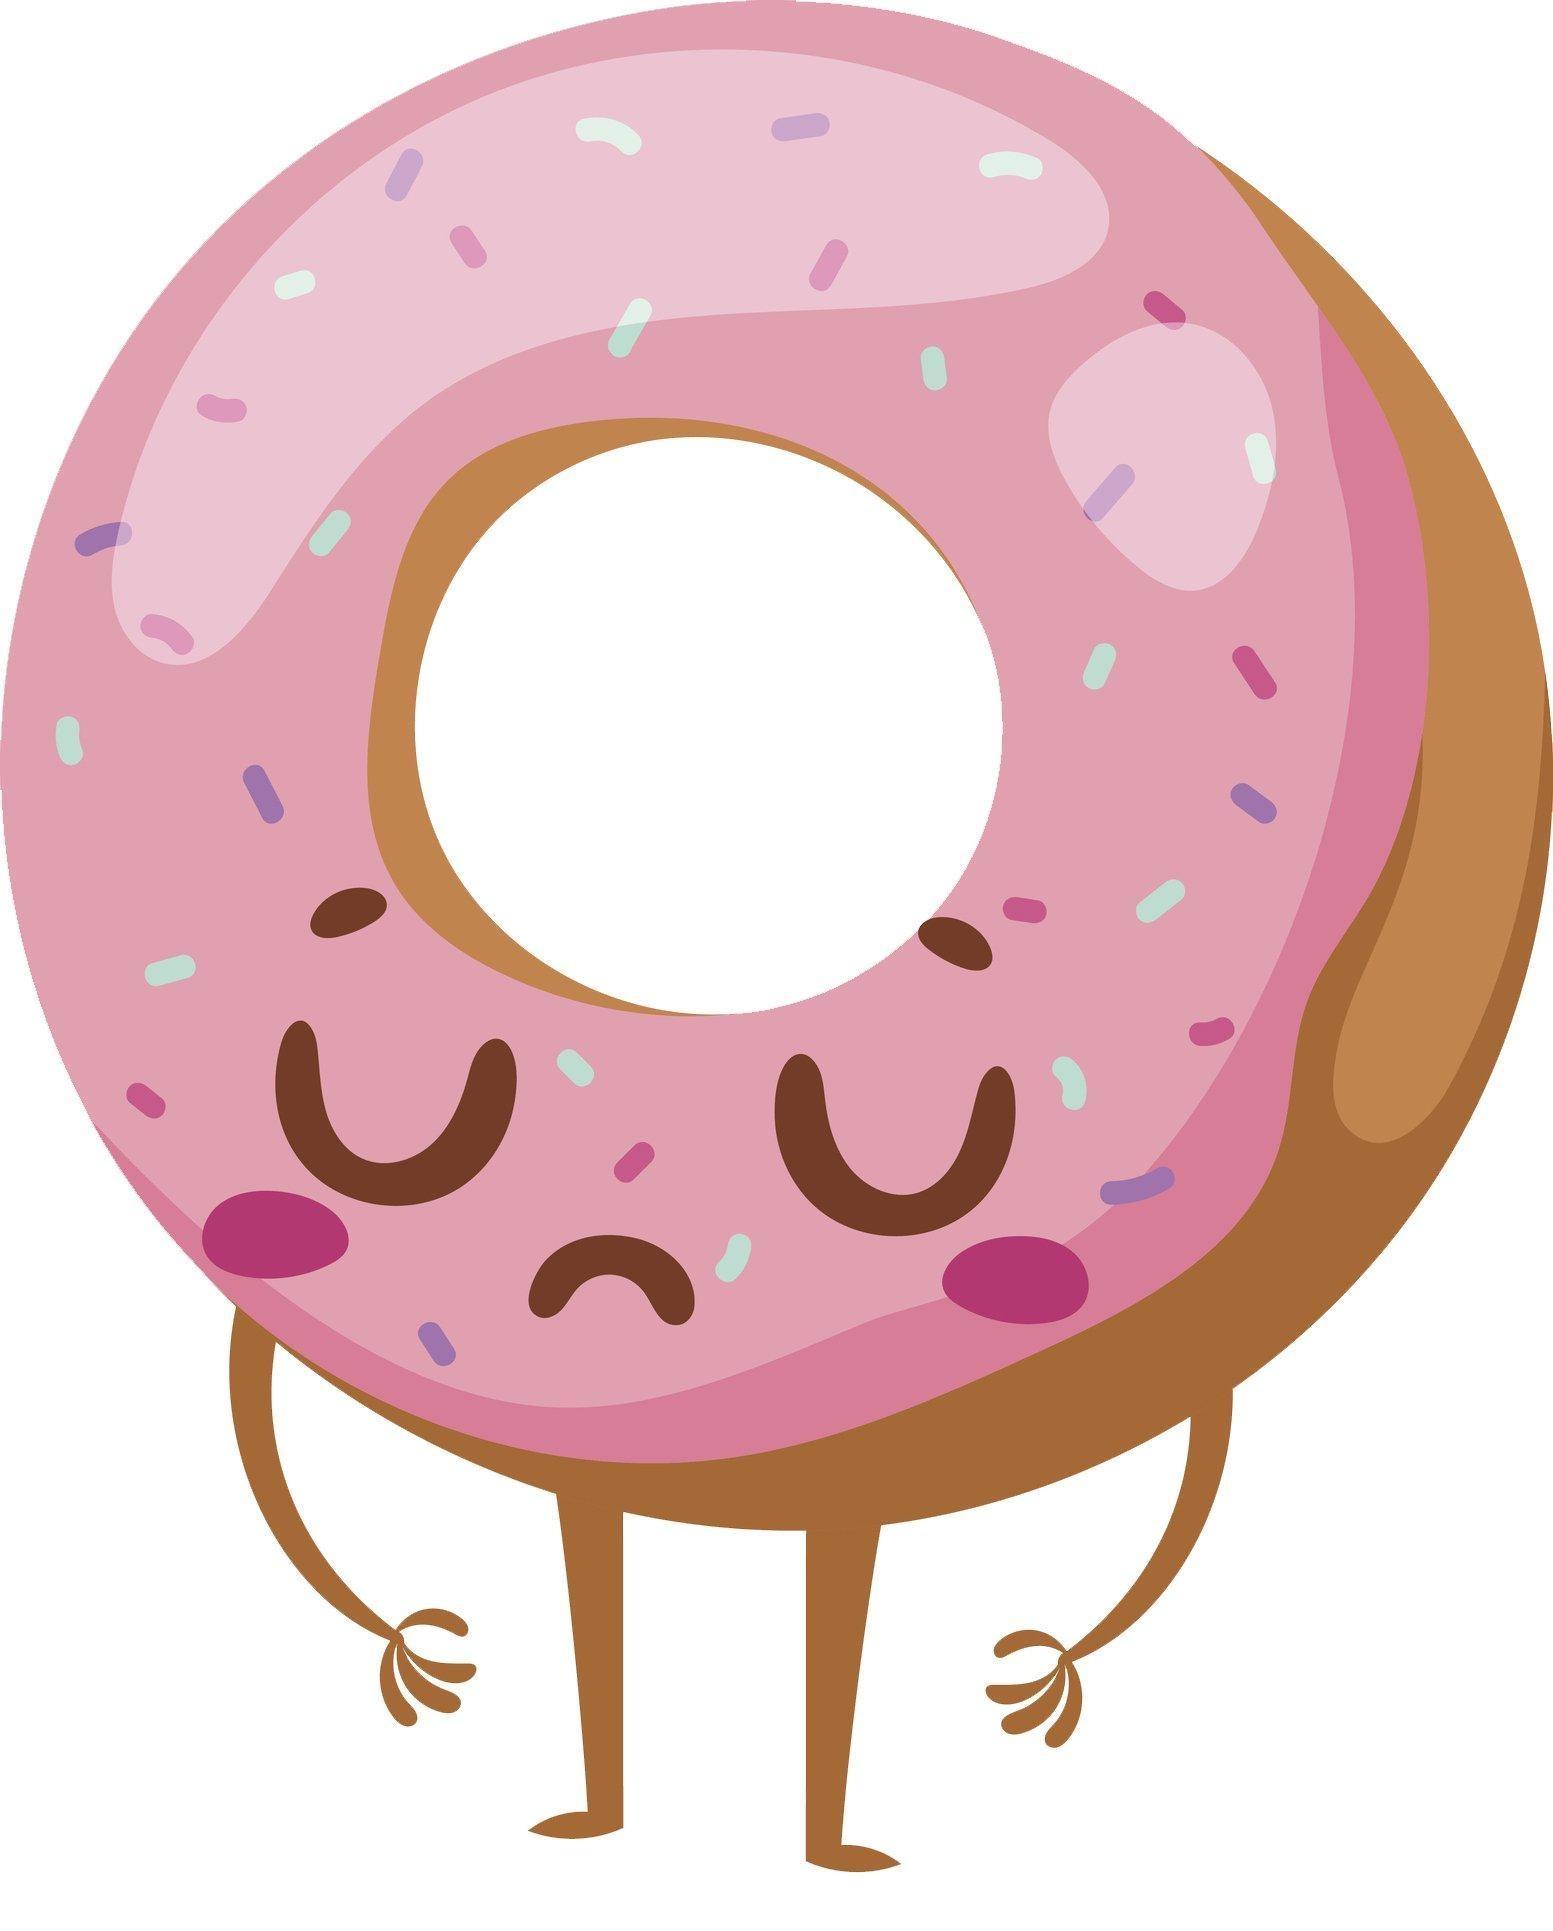 Online Store Sad Pretty Pink Strawberry Sprinkle Donut